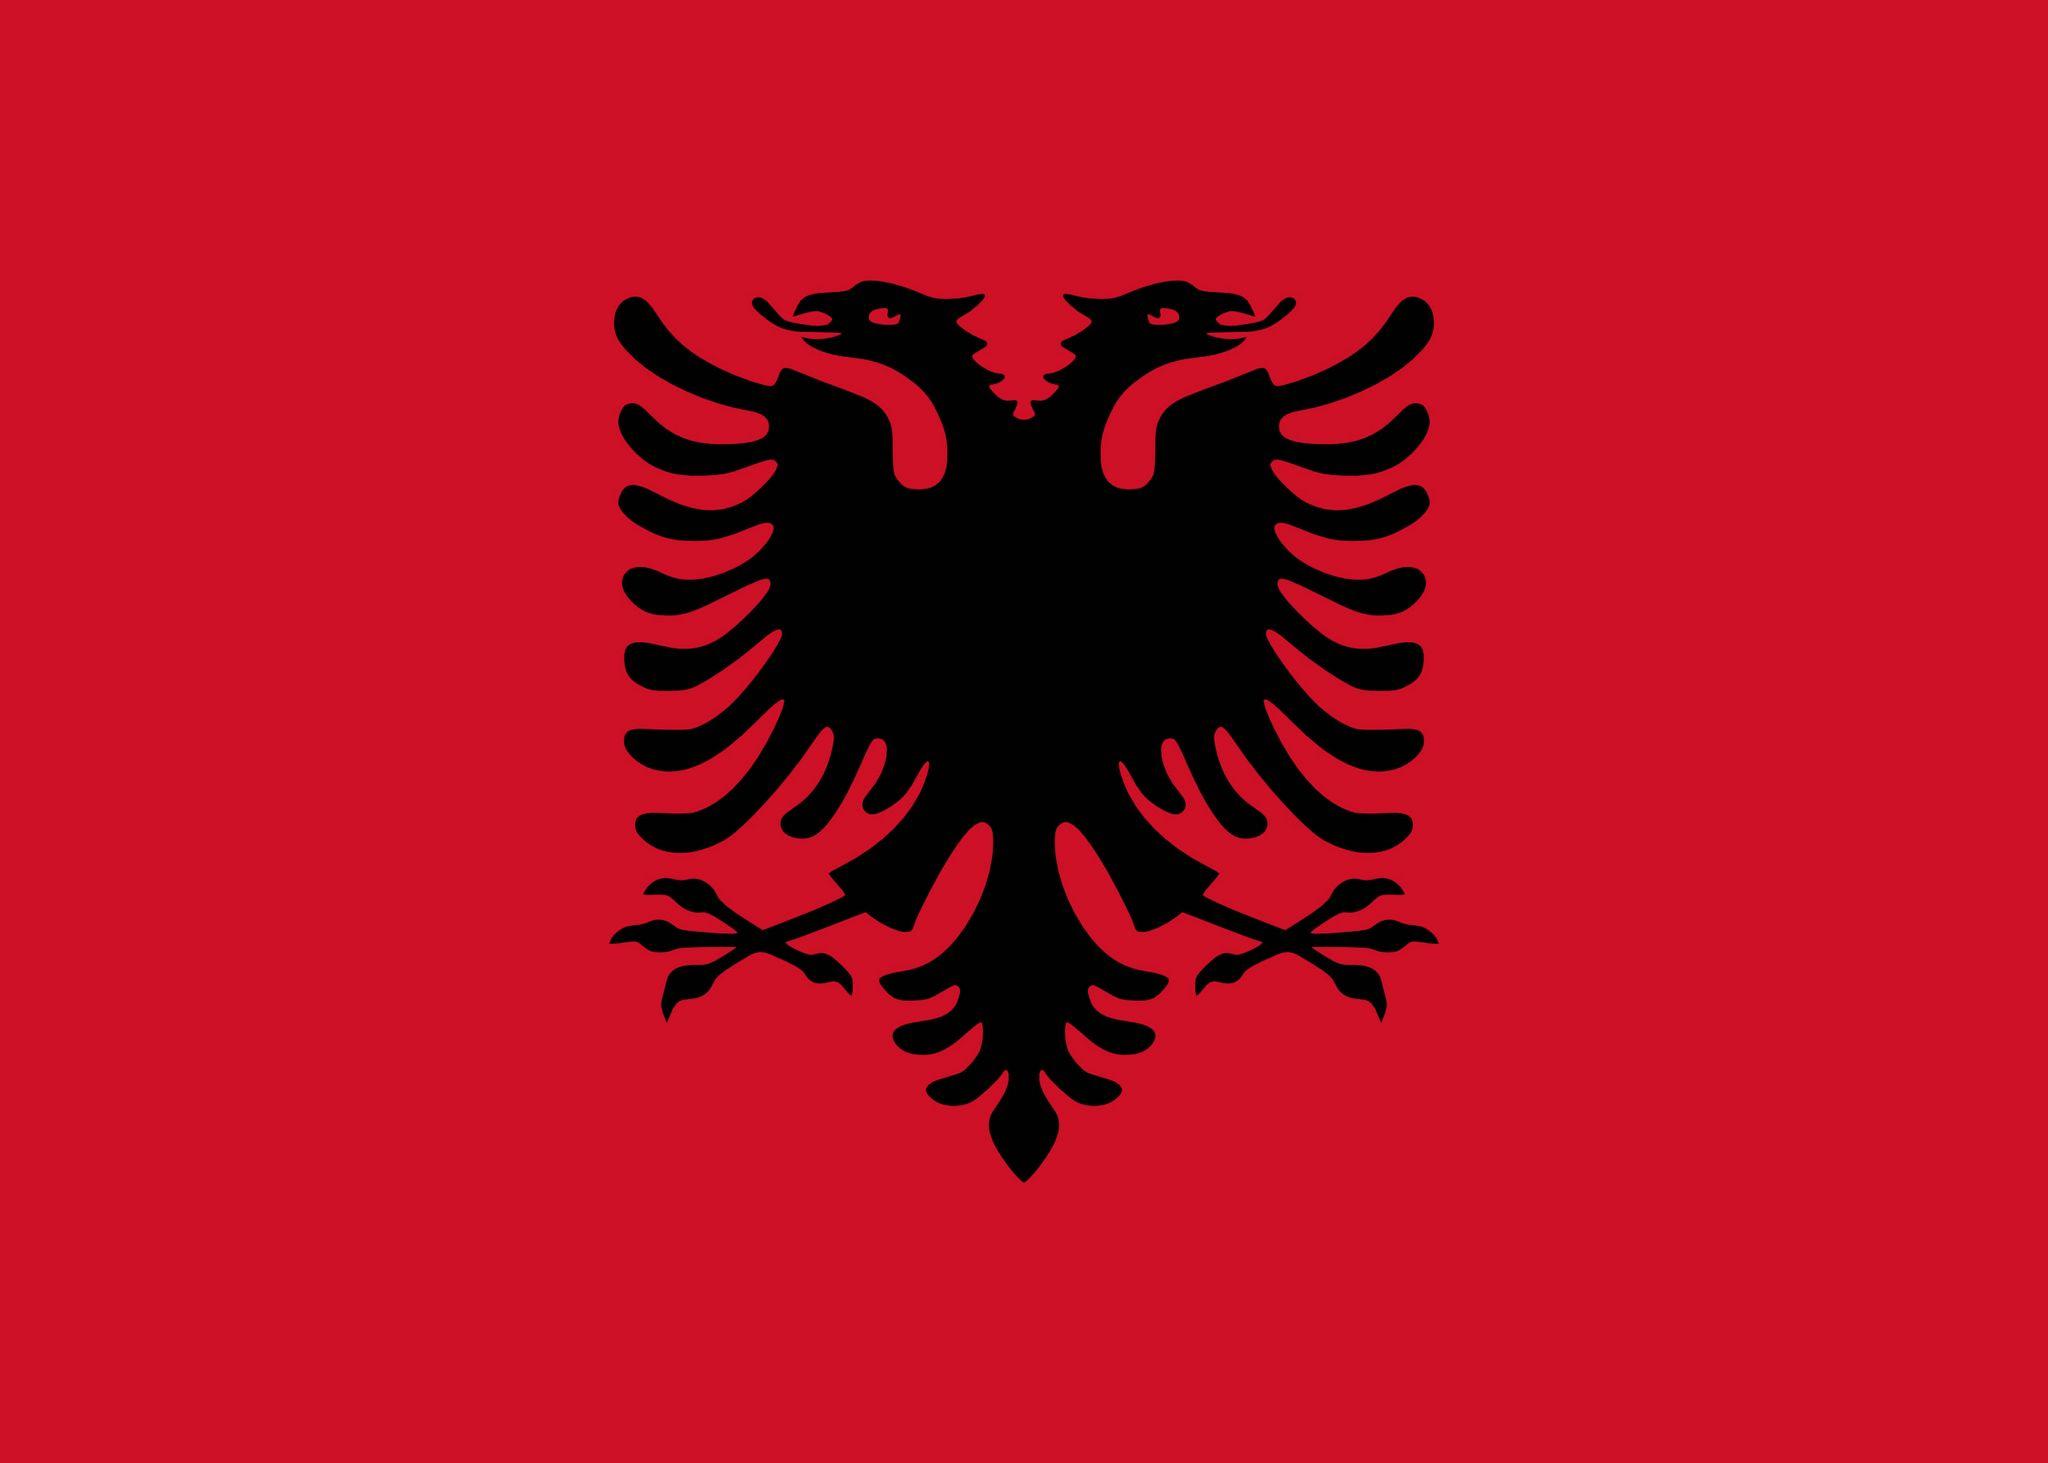 drapeau de lalbanie - Drapeau Espagnol A Imprimer